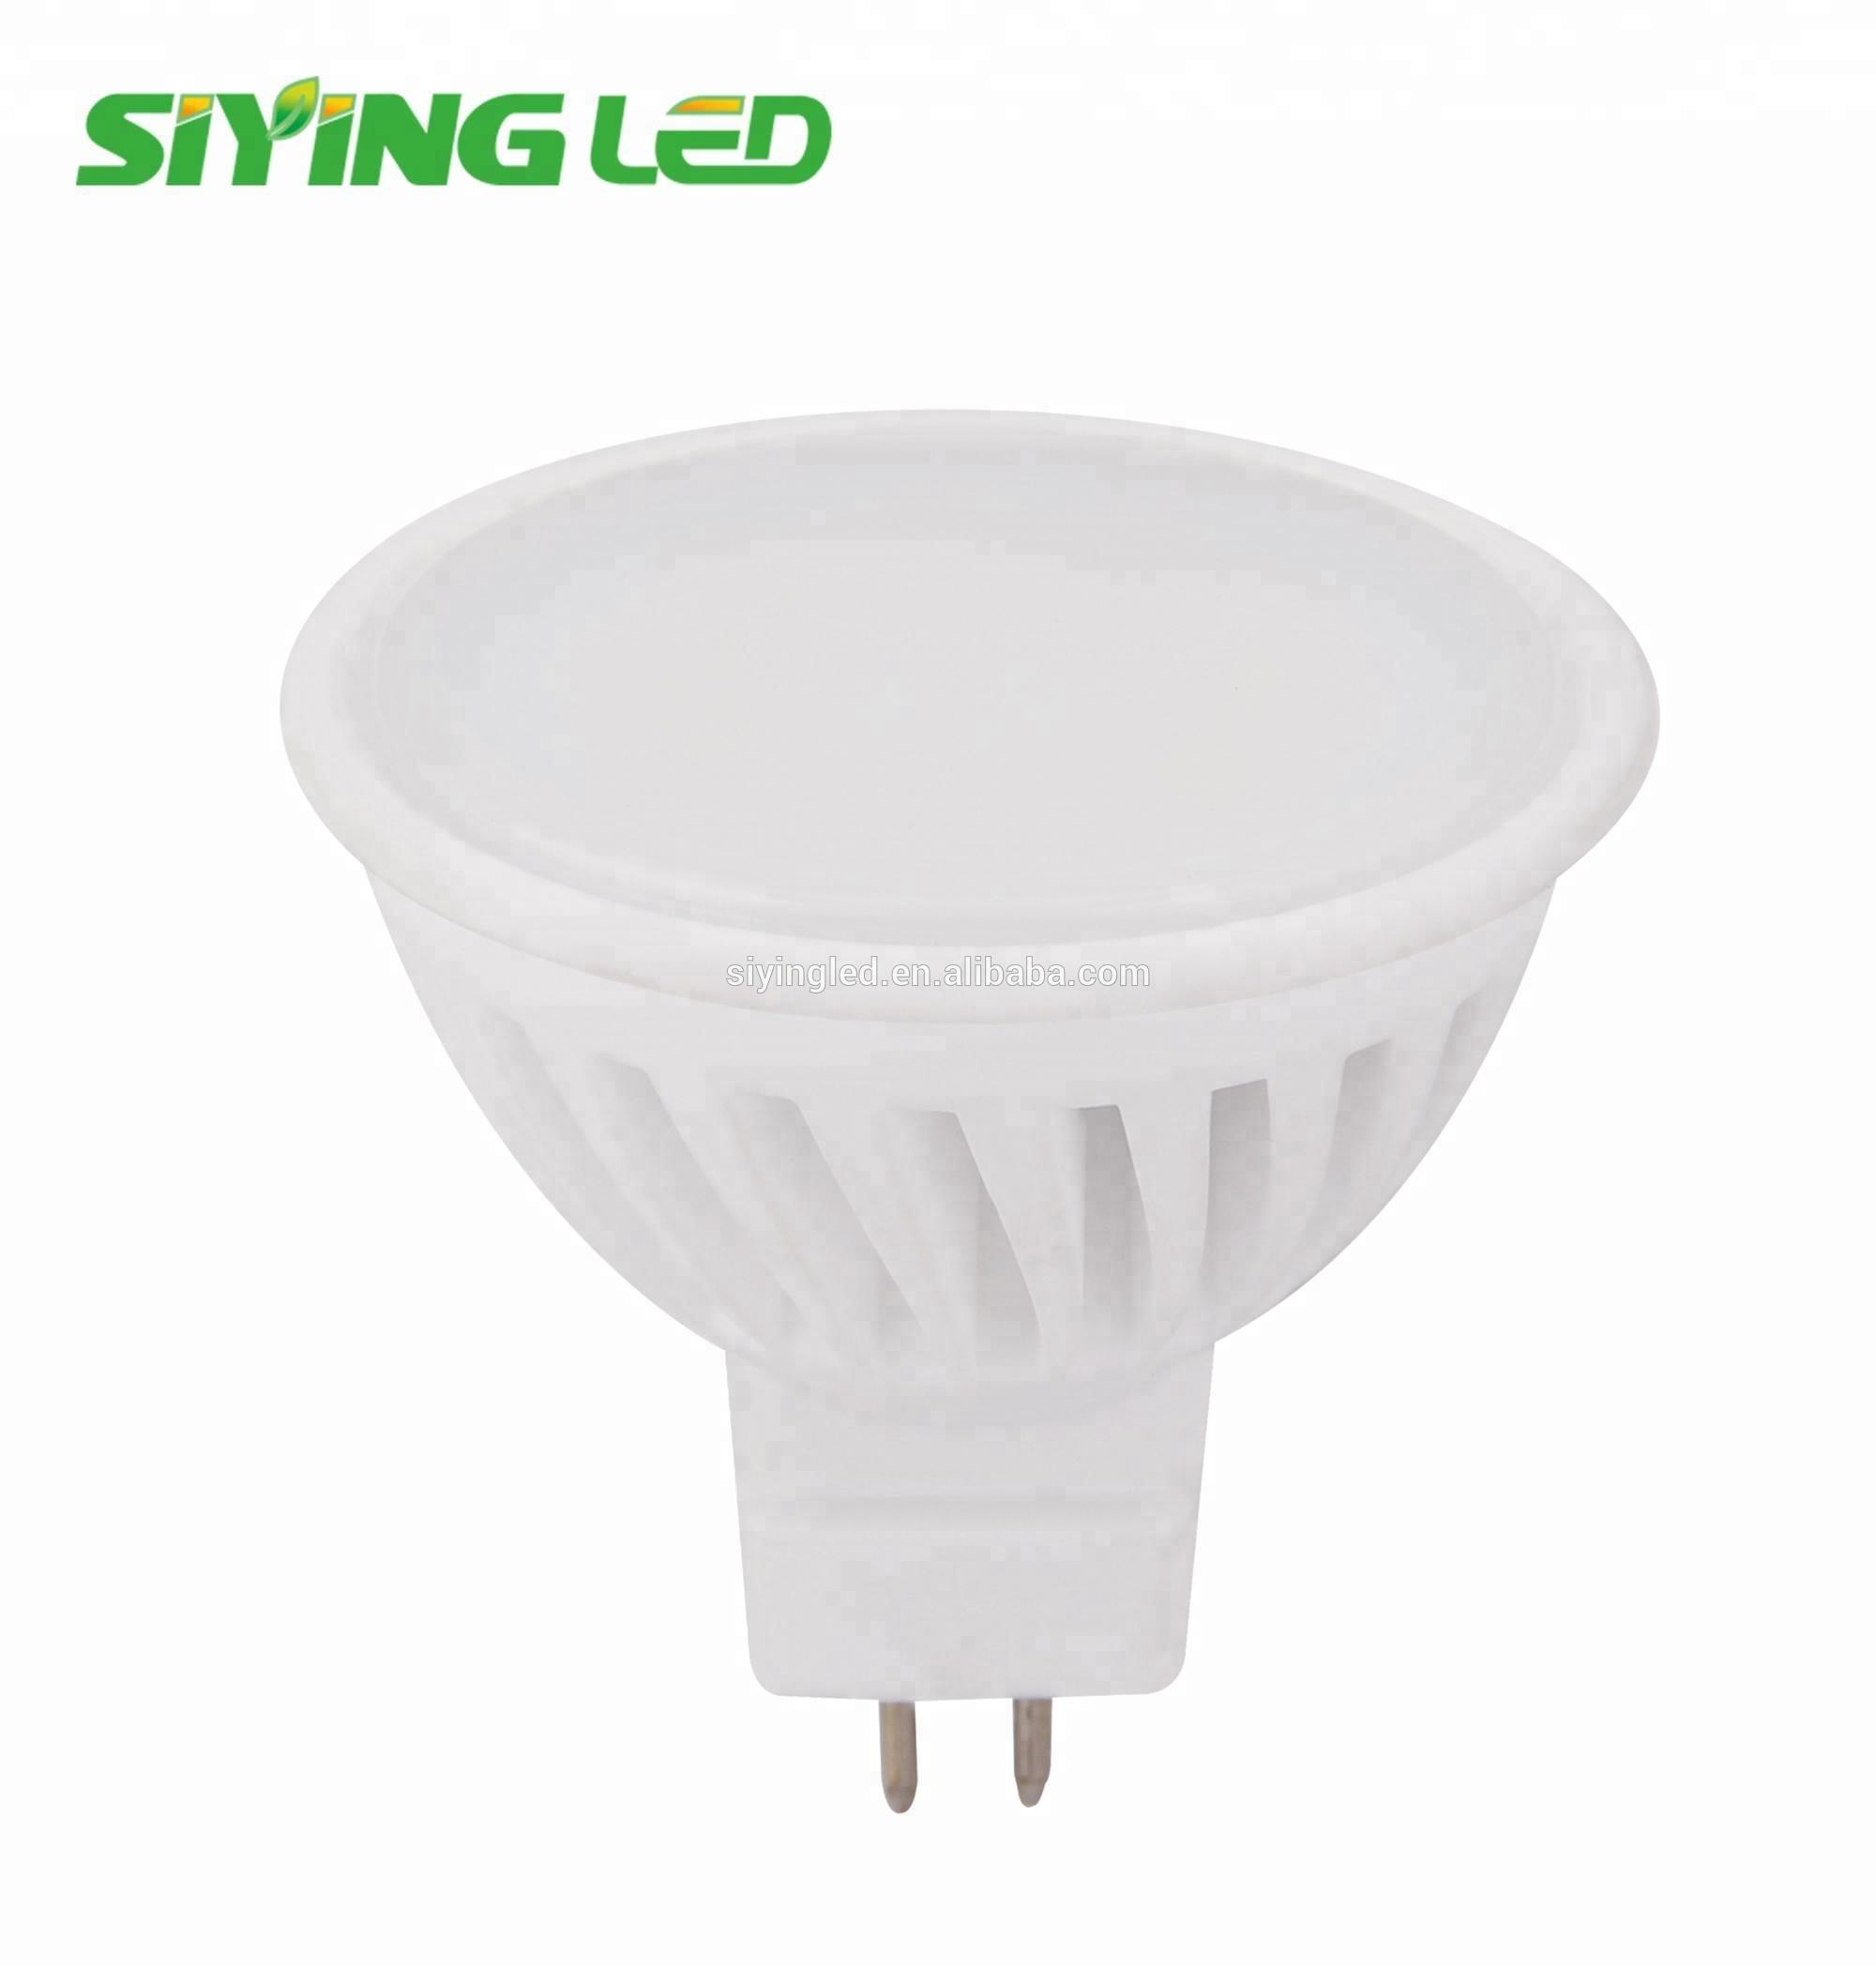 Best price High Power 8W MR16 ceramic SMD led spot light 3000K 4000K 6000K